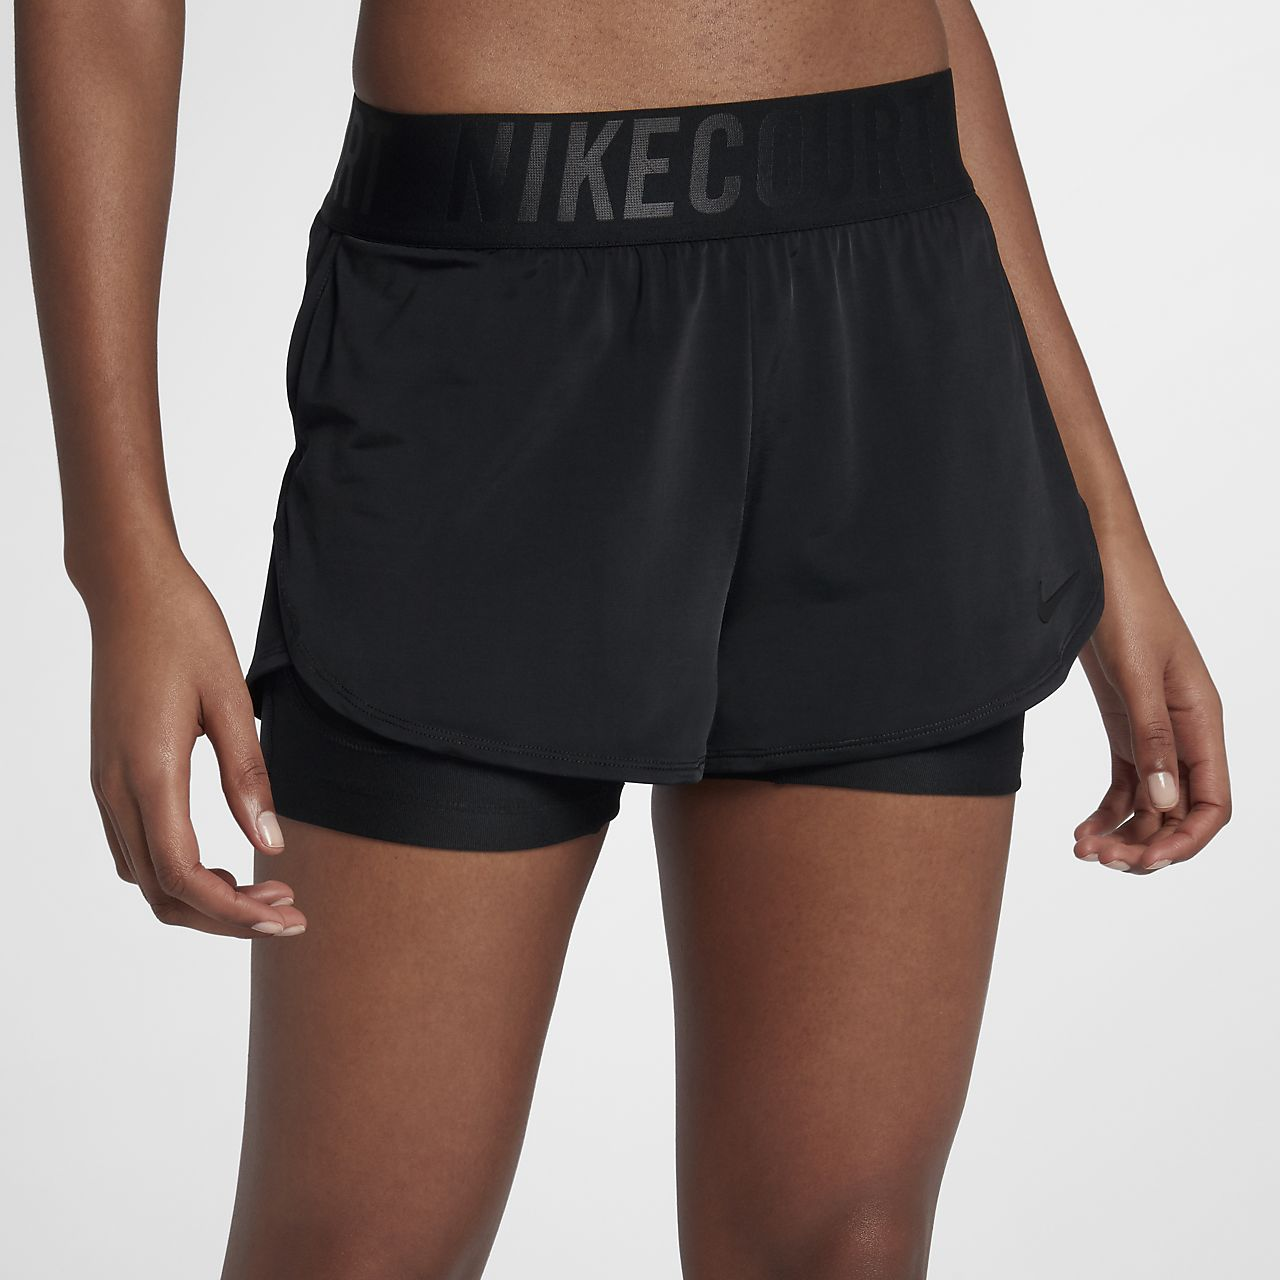 nikecourt dri fit ace women 39 s tennis shorts ae. Black Bedroom Furniture Sets. Home Design Ideas